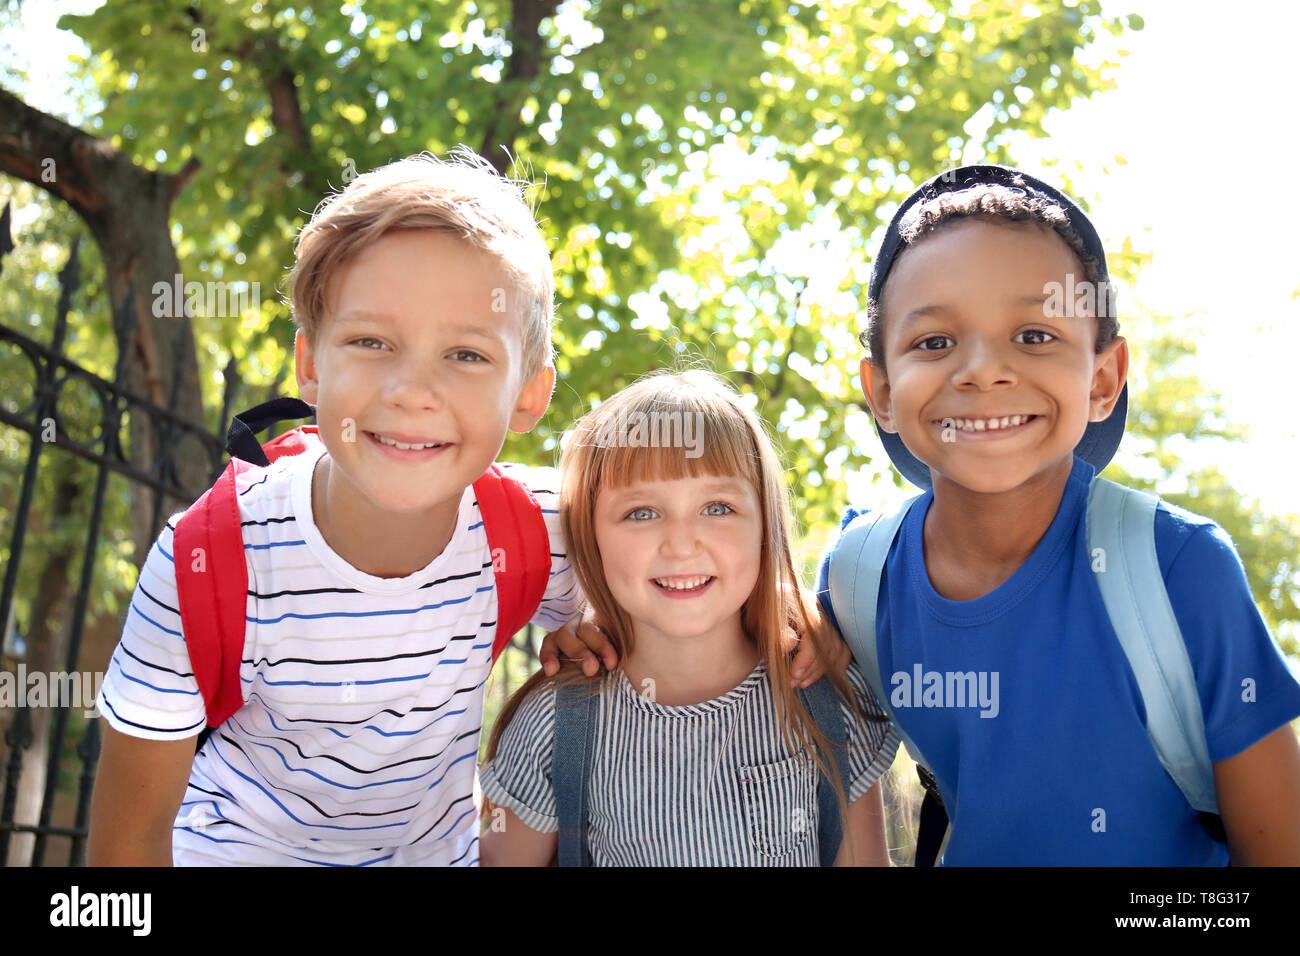 Cute little schoolchildren outdoors - Stock Image